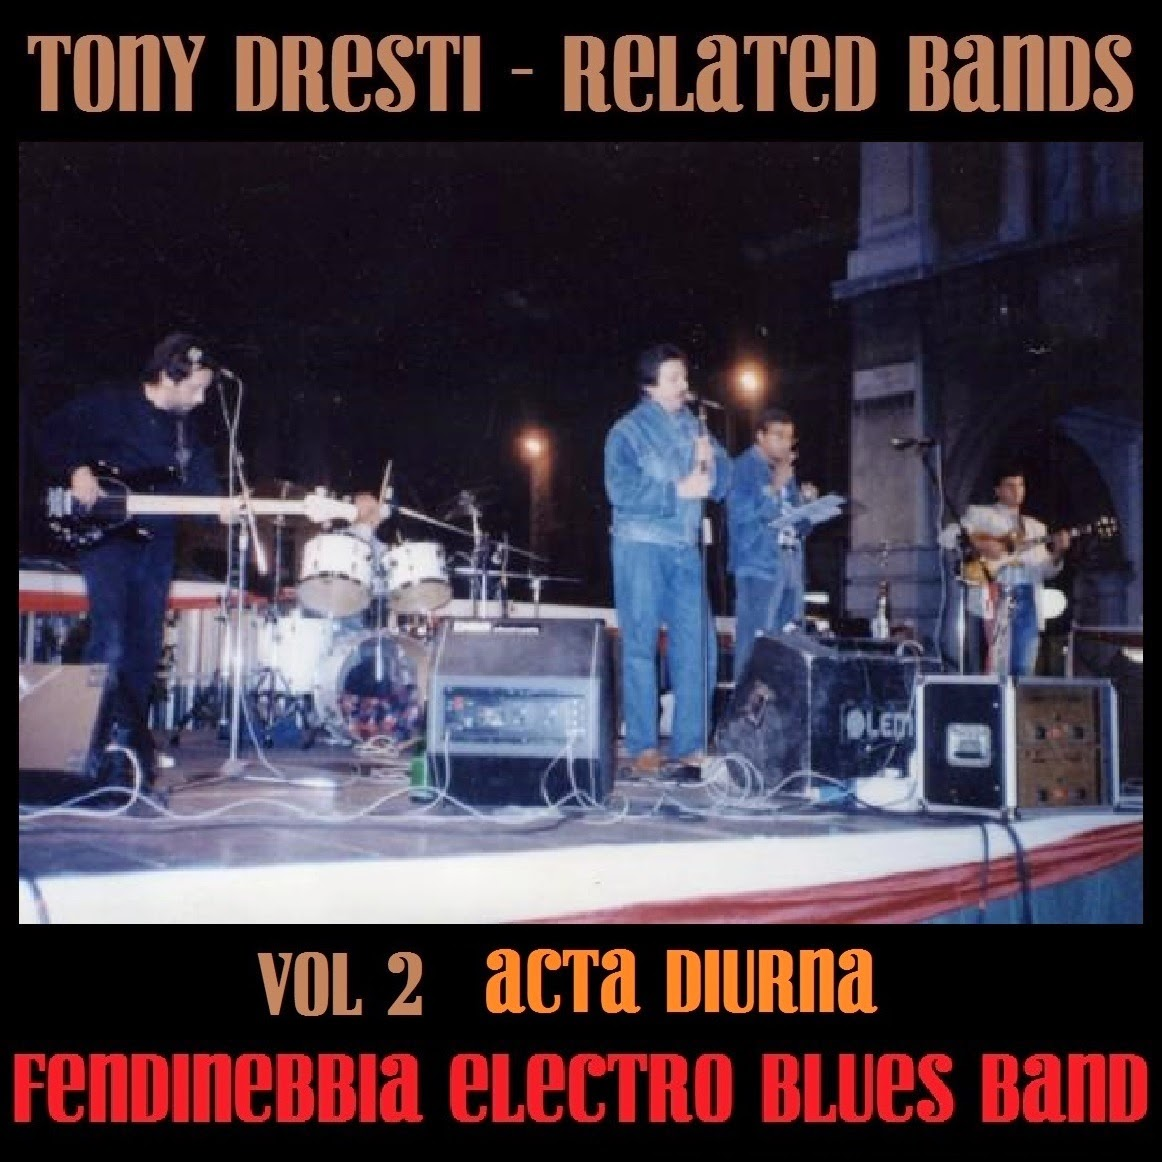 Fendinebbia Electro Blues Band - Transversal